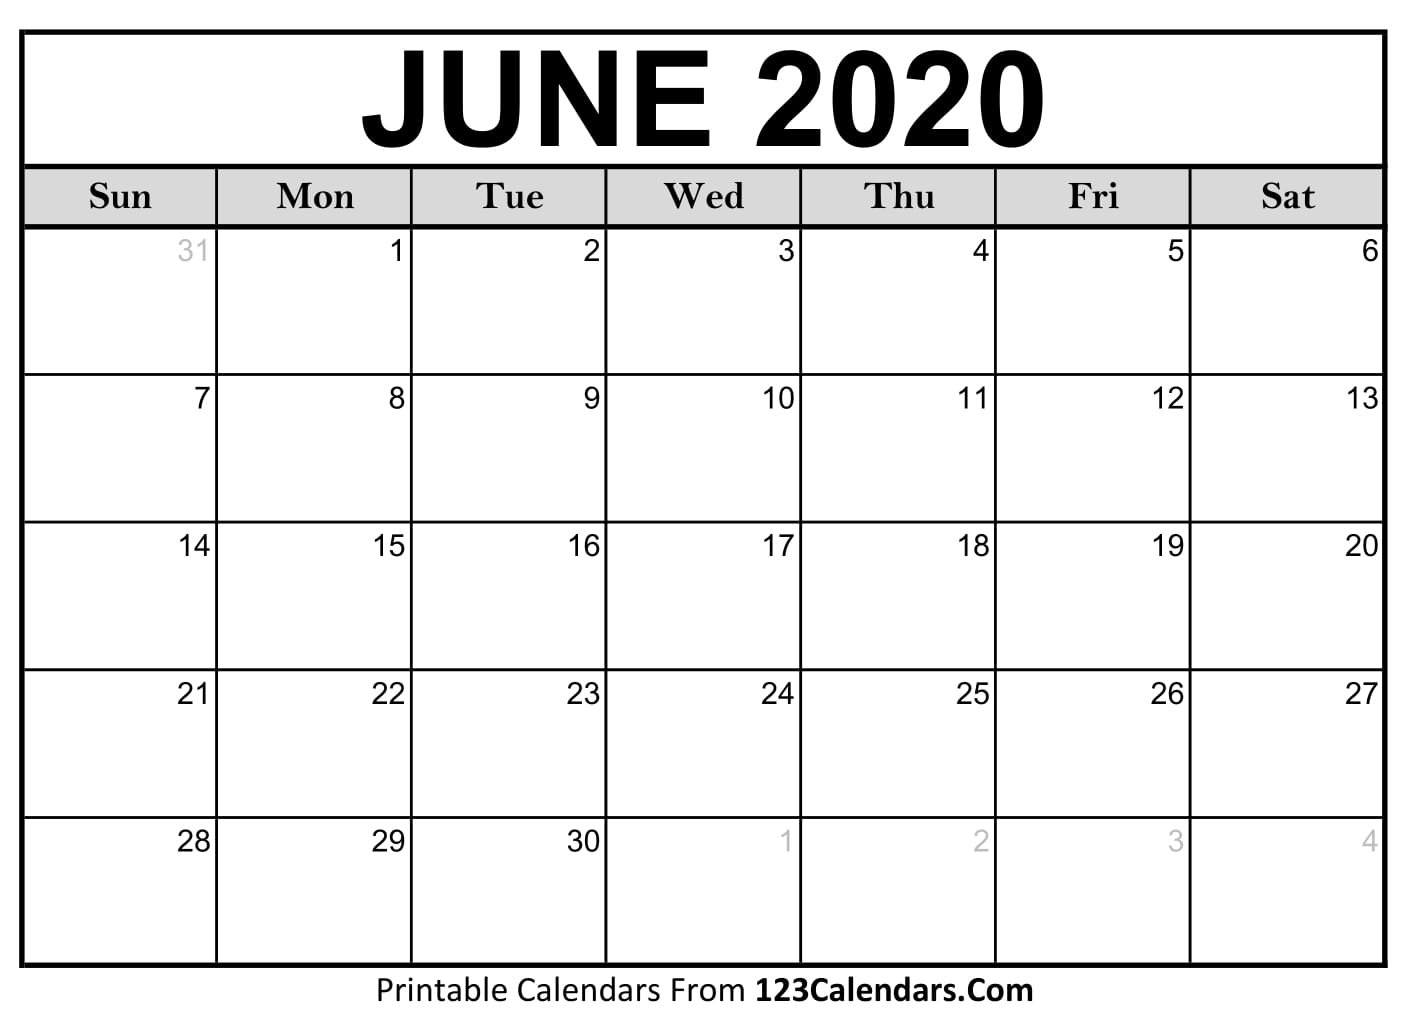 Free June 2020 Calendar | 123Calendars Printable Rip Off Day Calendar